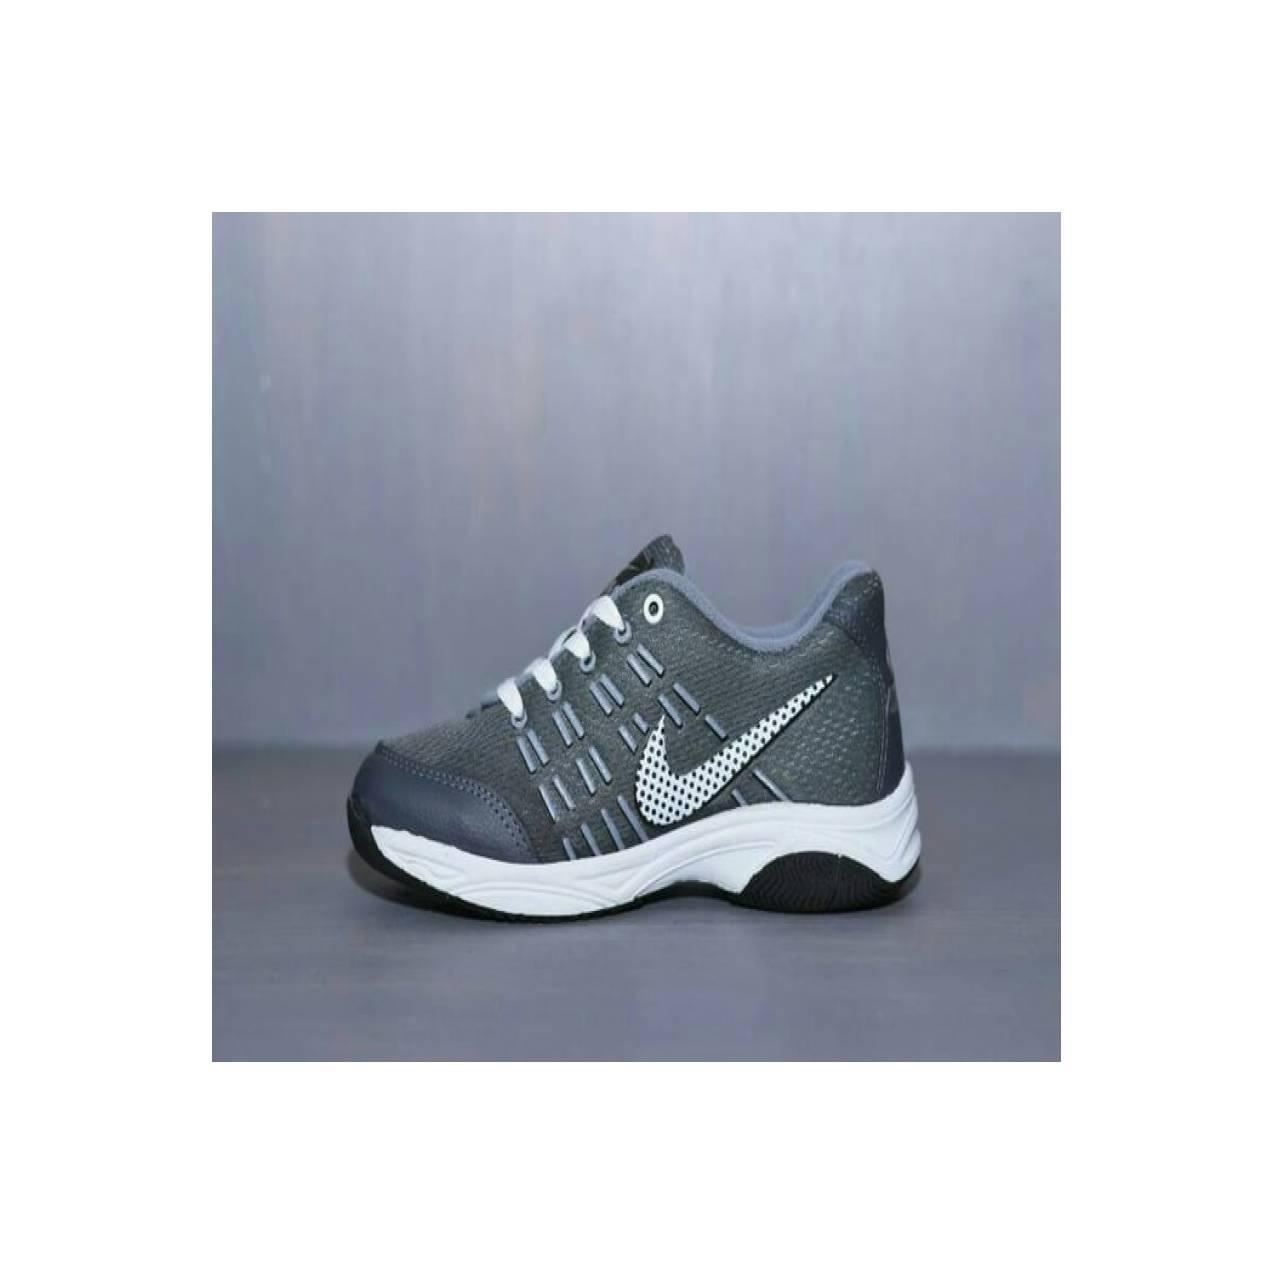 Sepatu Sport Nike Airmax 2016 Abu Abu / Olahraga Jogging Badminton